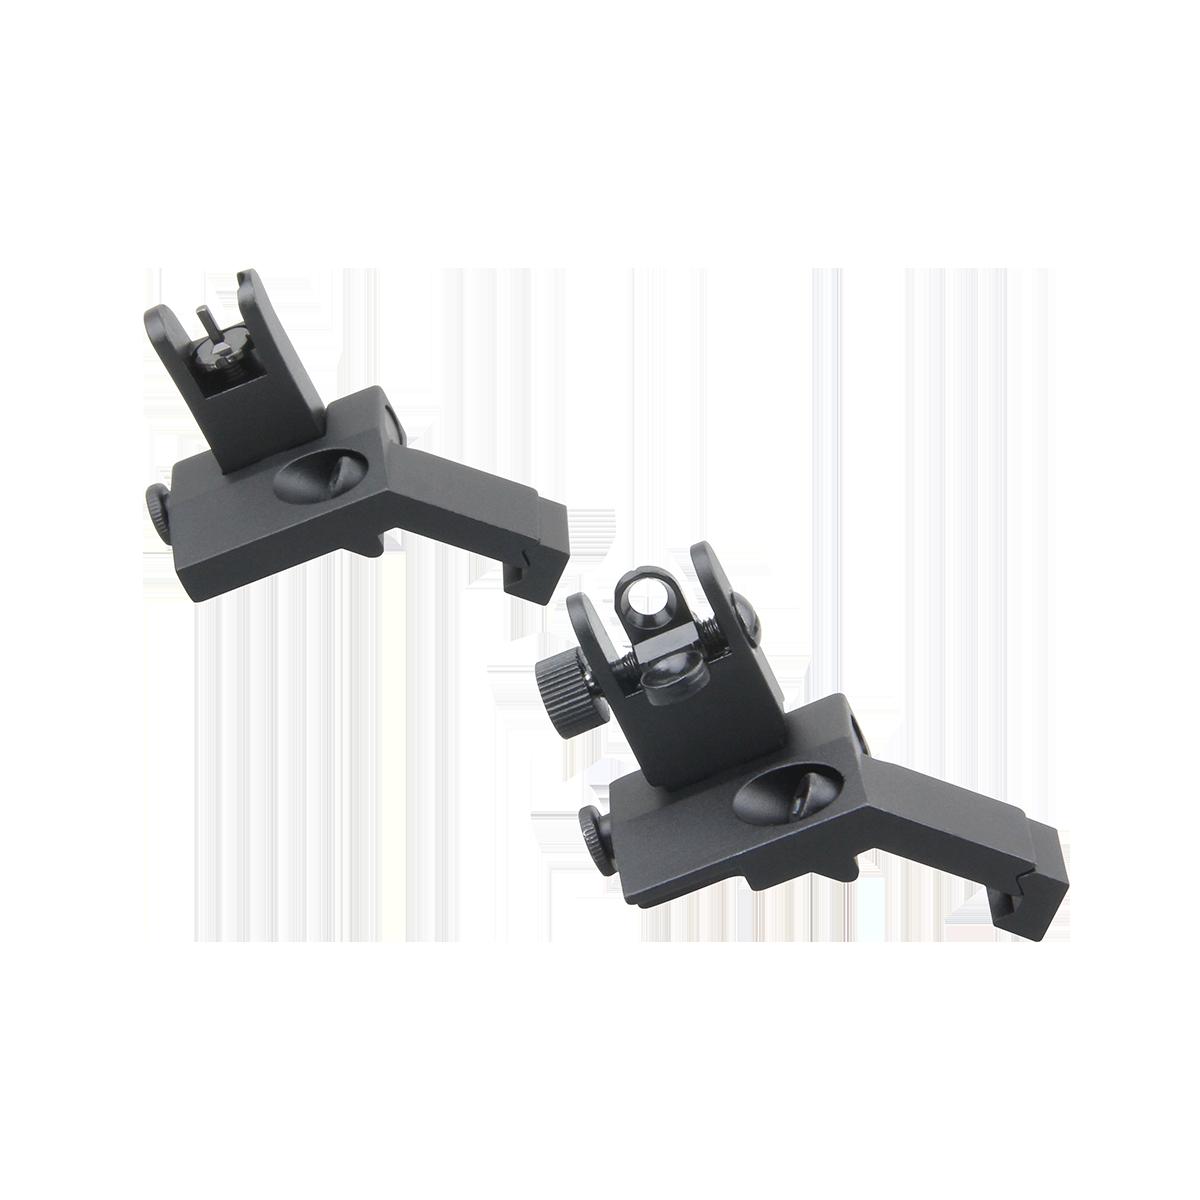 45° Offset Backup Flip-up Iron Sights BUIS